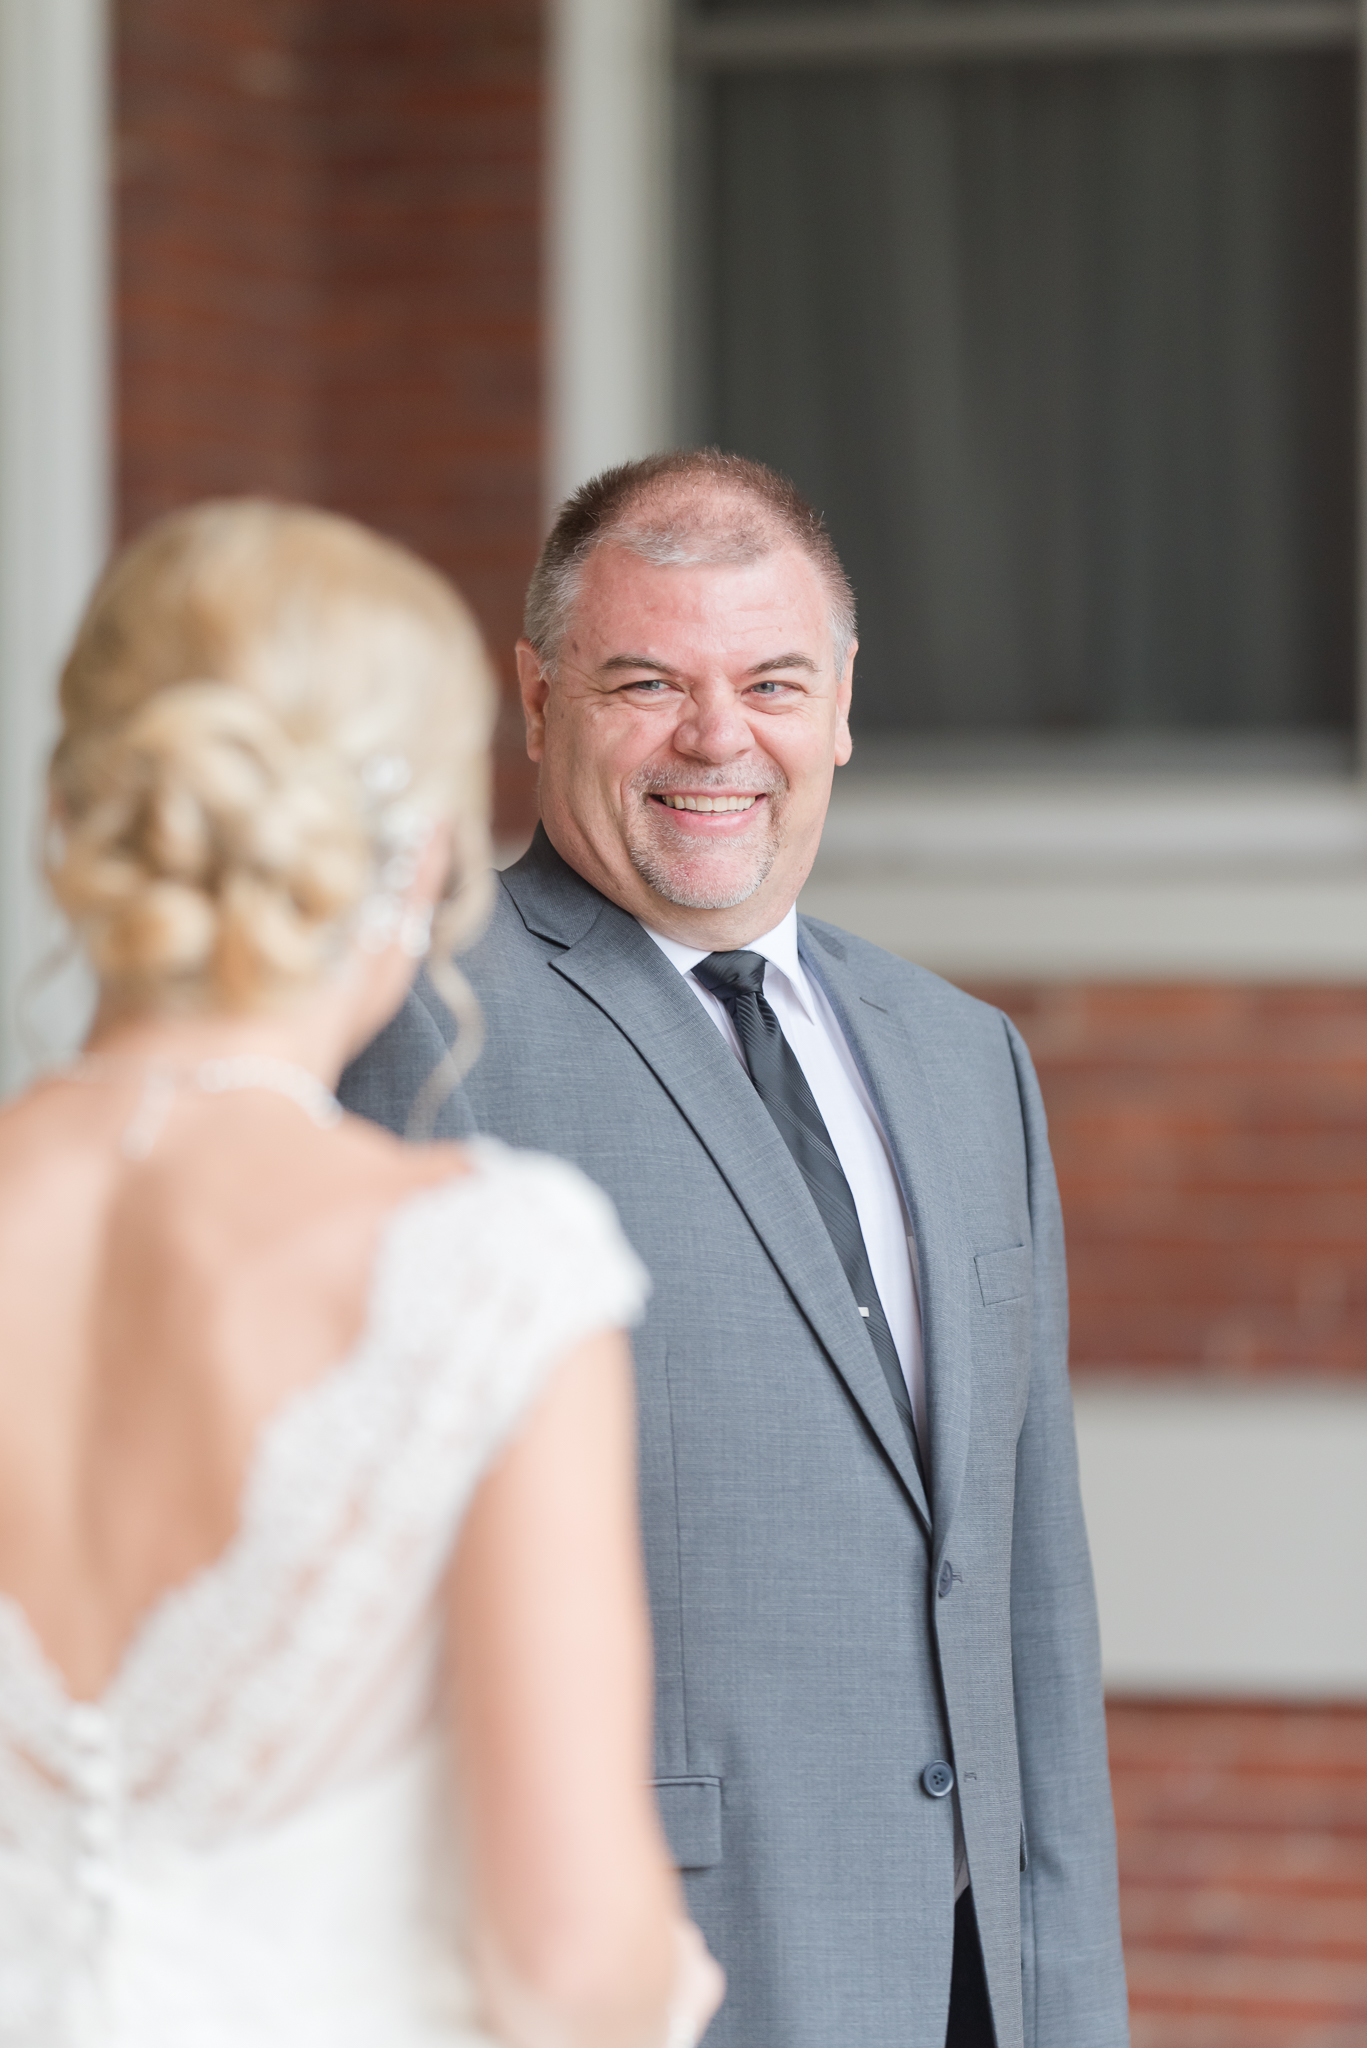 Westminister Hall Wedding Winona Lake Indiana8270.jpg